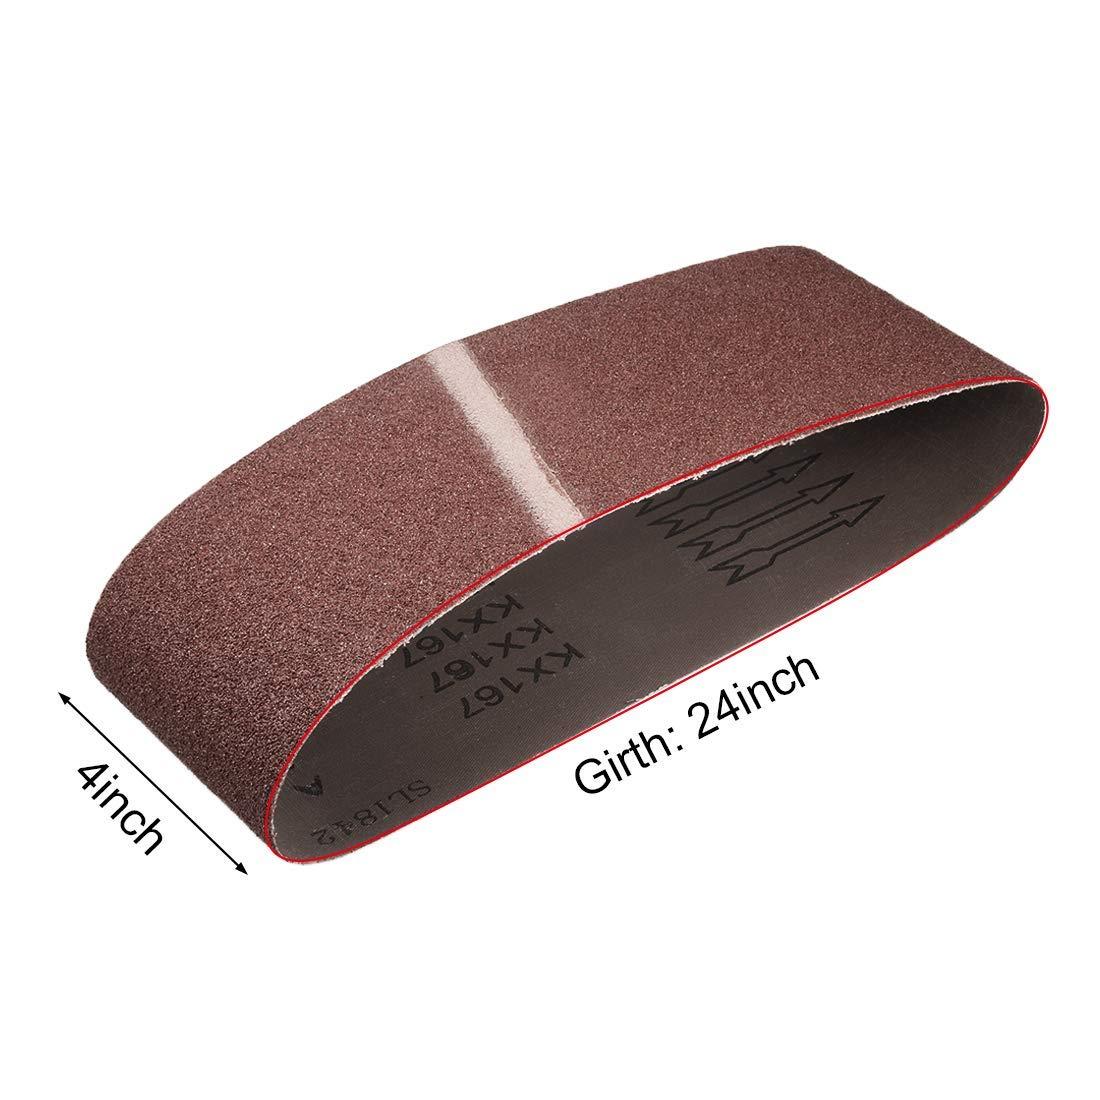 ZCHXD 4 x 24 Abrasive Sanding Belt 60-Grits Aluminum Oxide Sand Belts for Belt Sander 4pcs